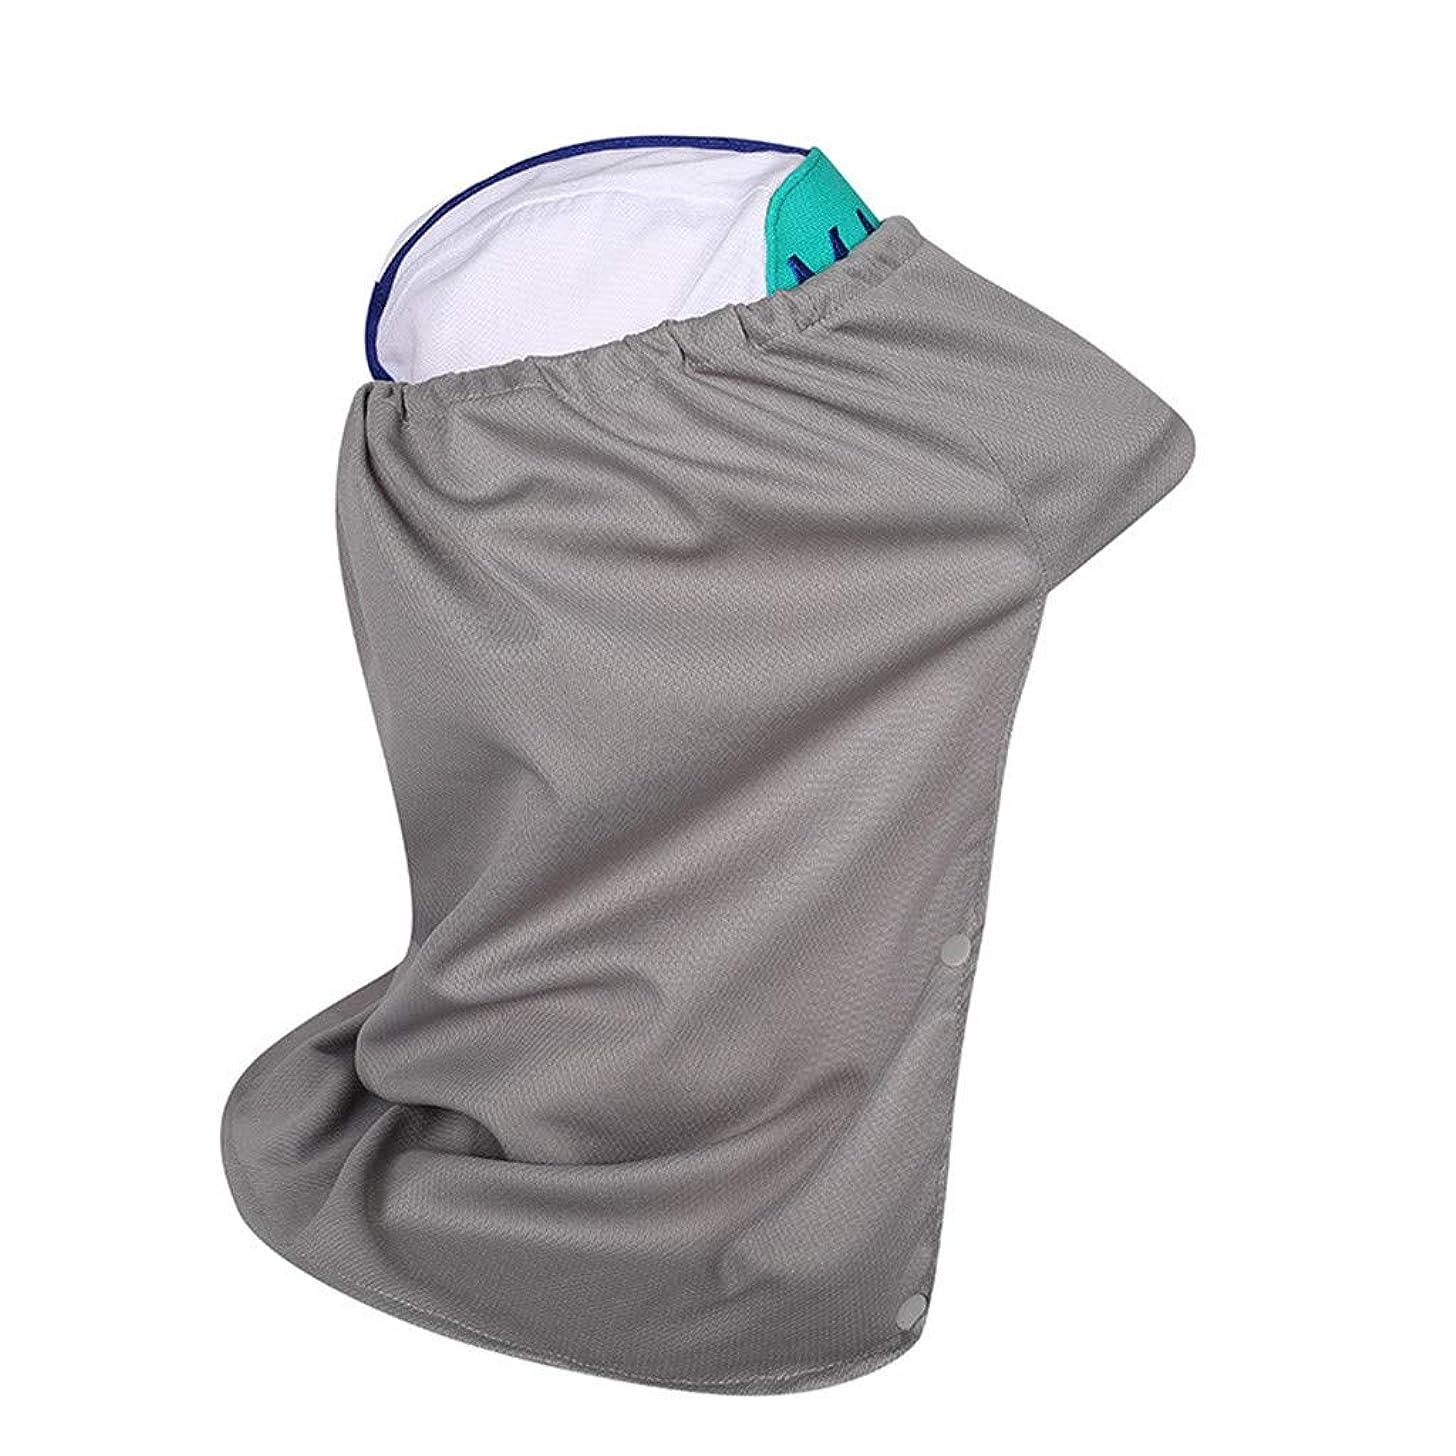 Sagton Quick Drying 360 Degree Sun UV Protection Outdoor Sun Hat Fishing Cap for Fishing Hiking Camping Safari Beach Hat